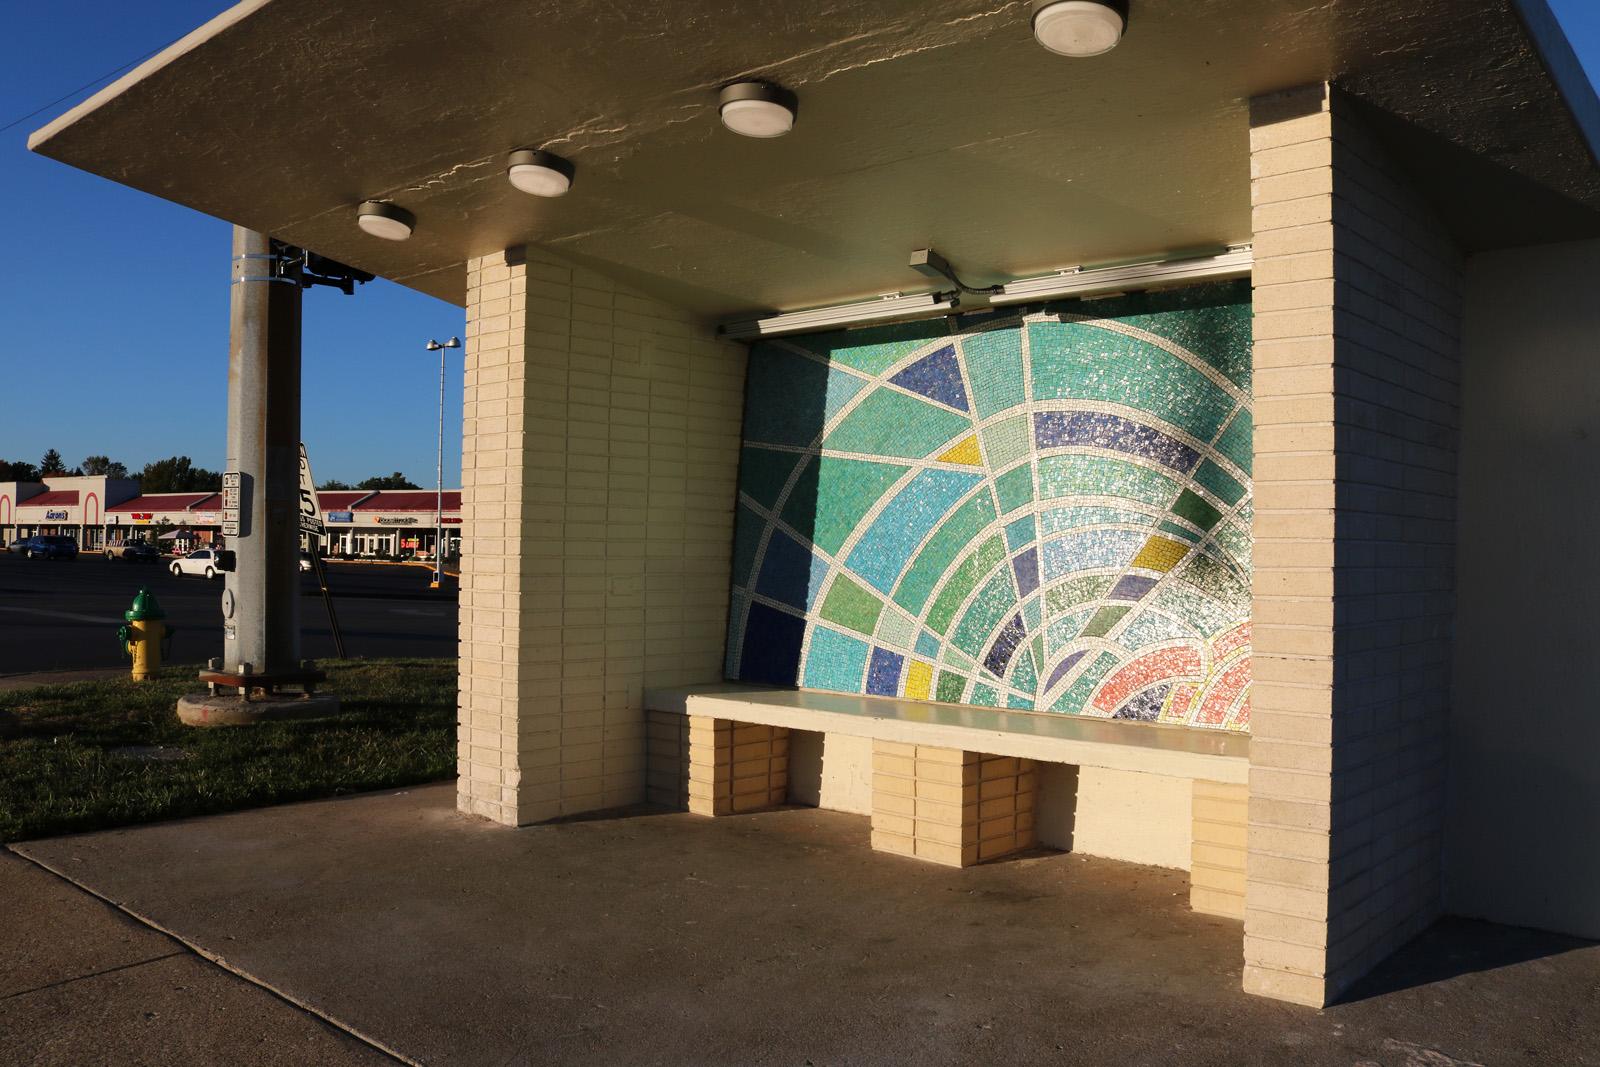 South Beach bus shelter